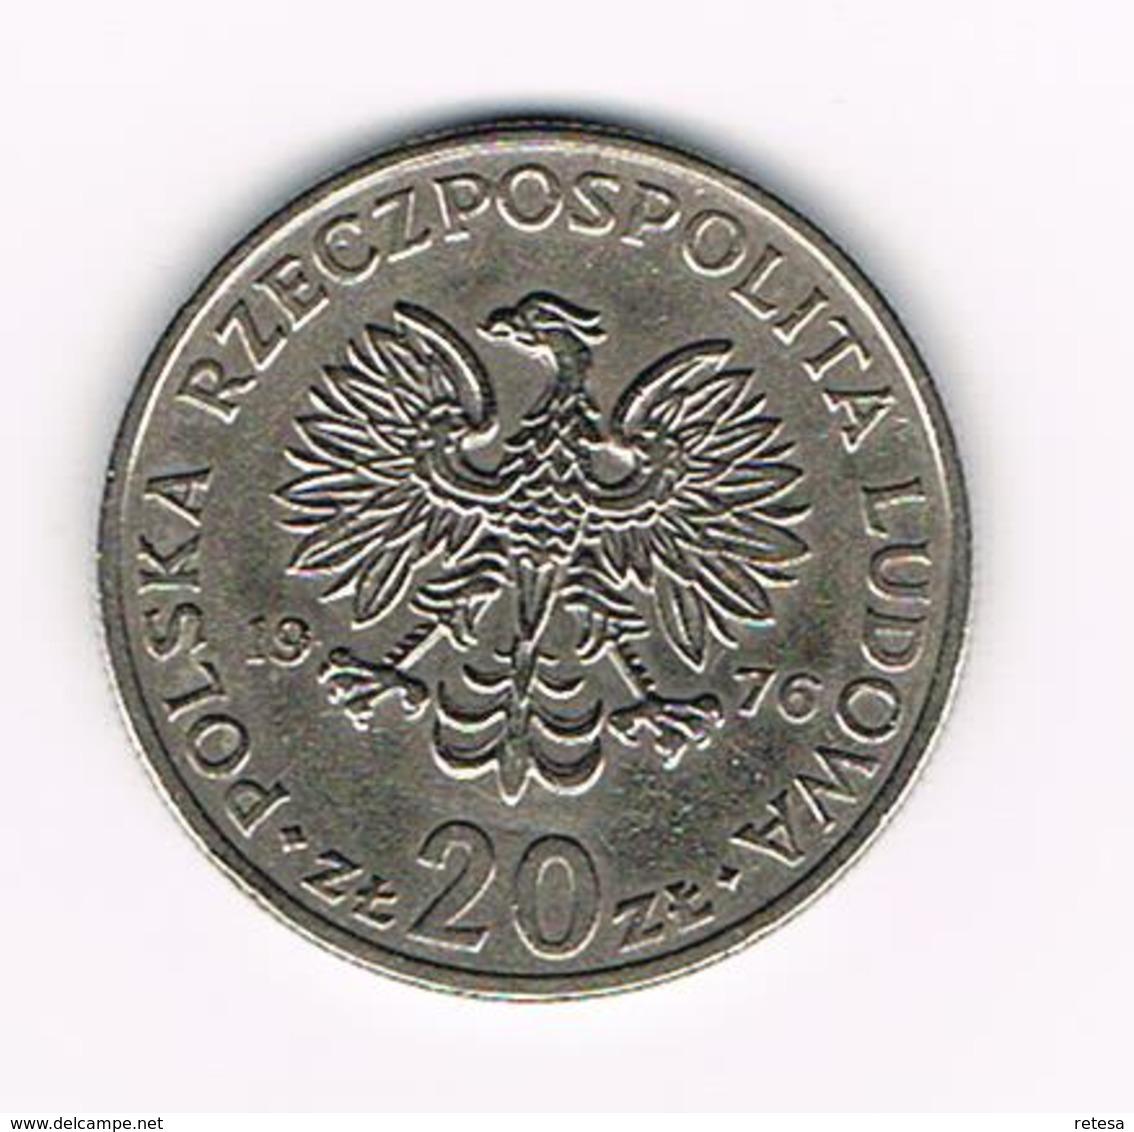 &-  POLEN  20 ZLOTYCH  MARCELI NOWOTKO  1976 - Pologne